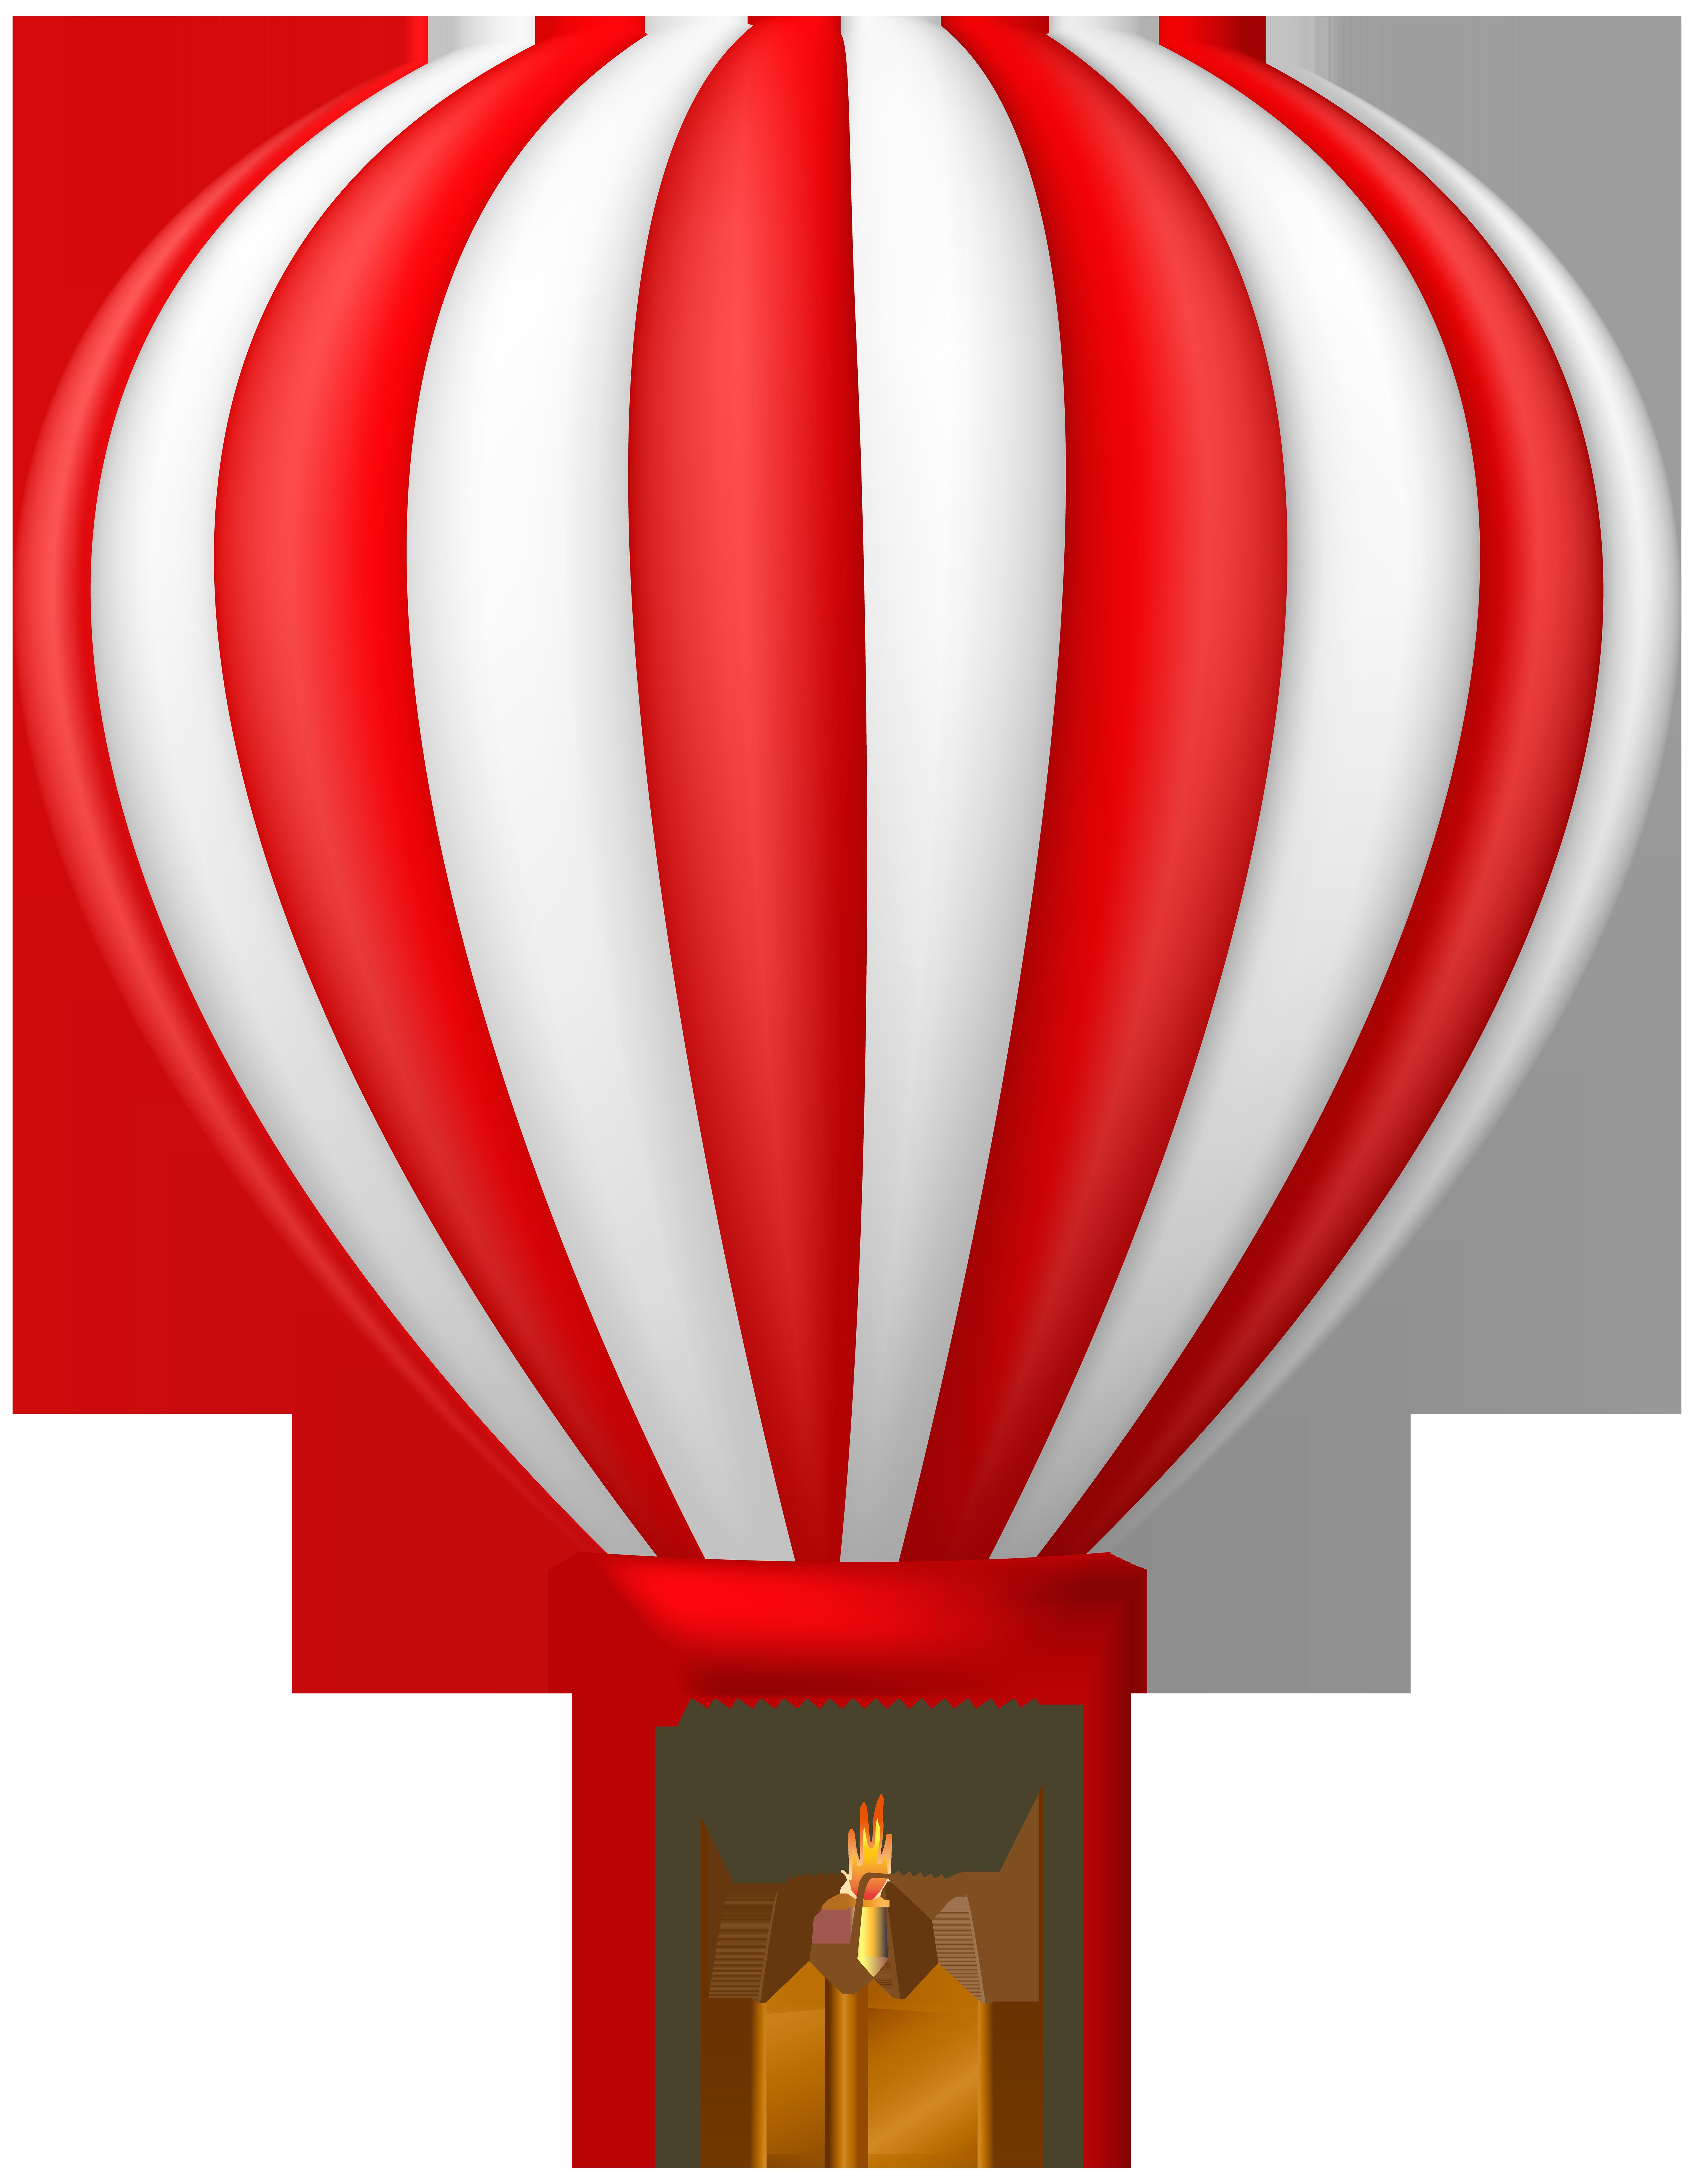 6204x8000 Red Hot Air Balloon Transparent Png Clip Artu200b Gallery